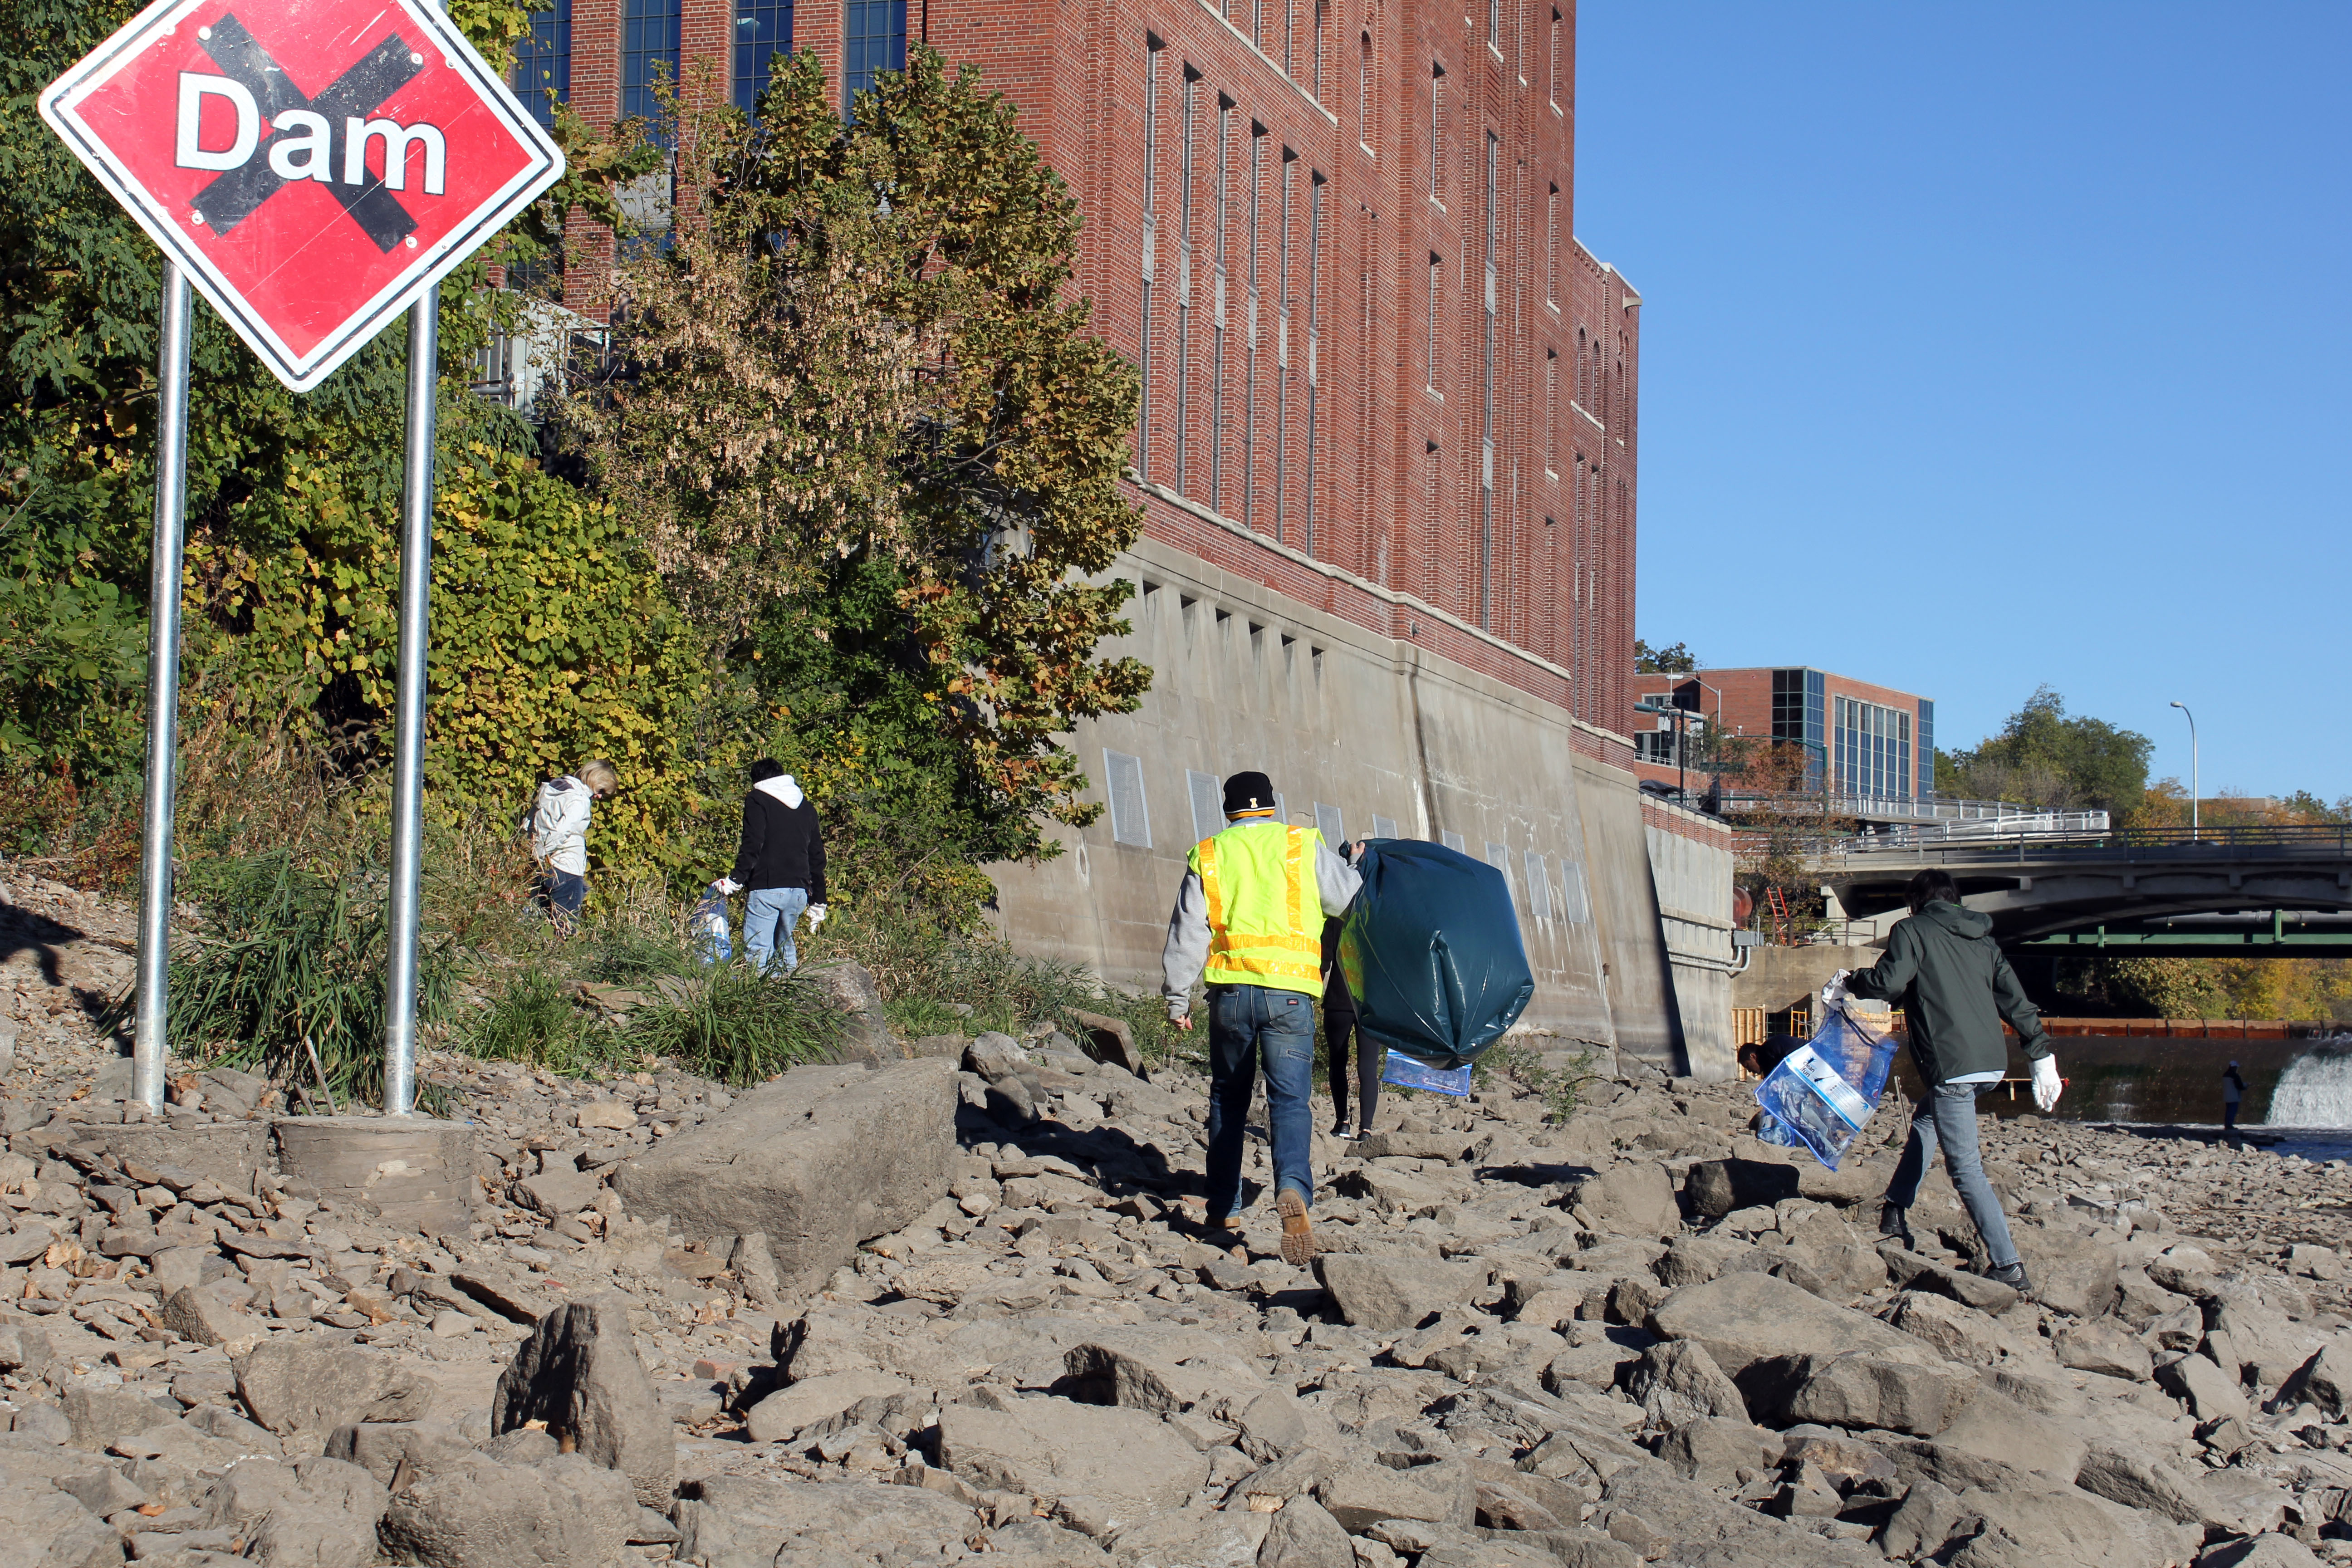 Volunteers help clean up the Iowa River.